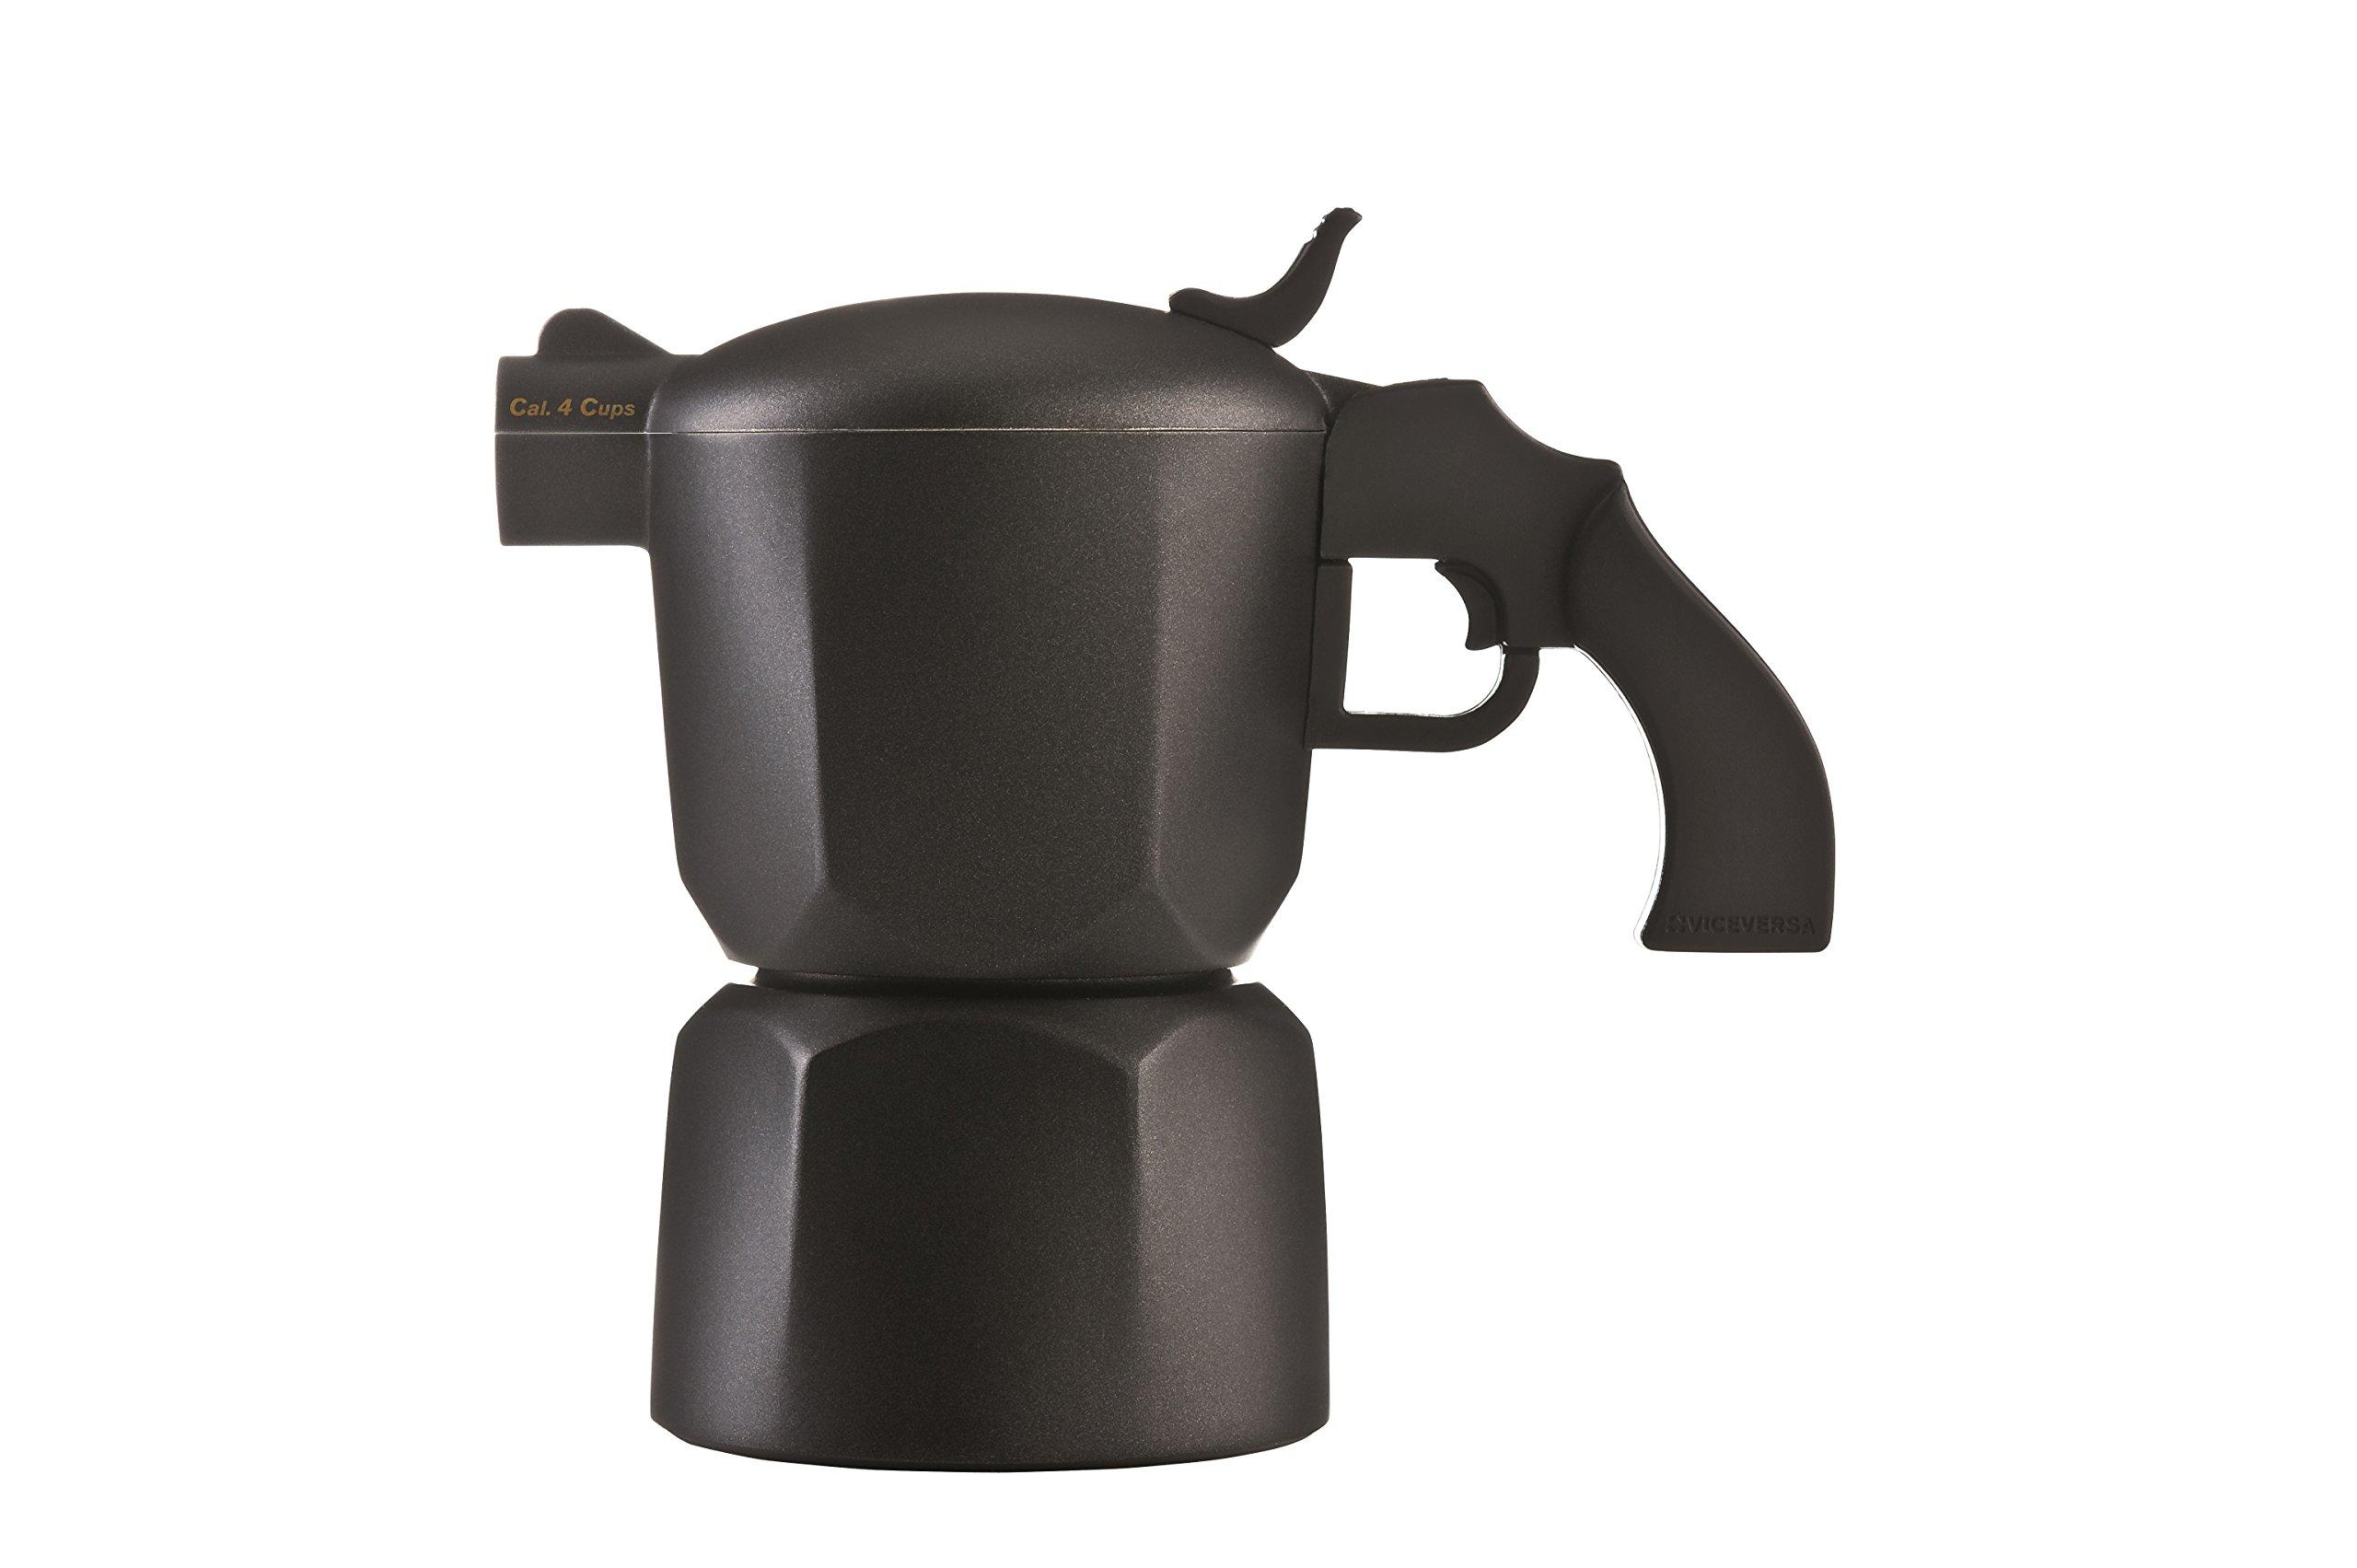 Viceversa: Coffee Maker Noir 4 Cups [ Italian Import ]